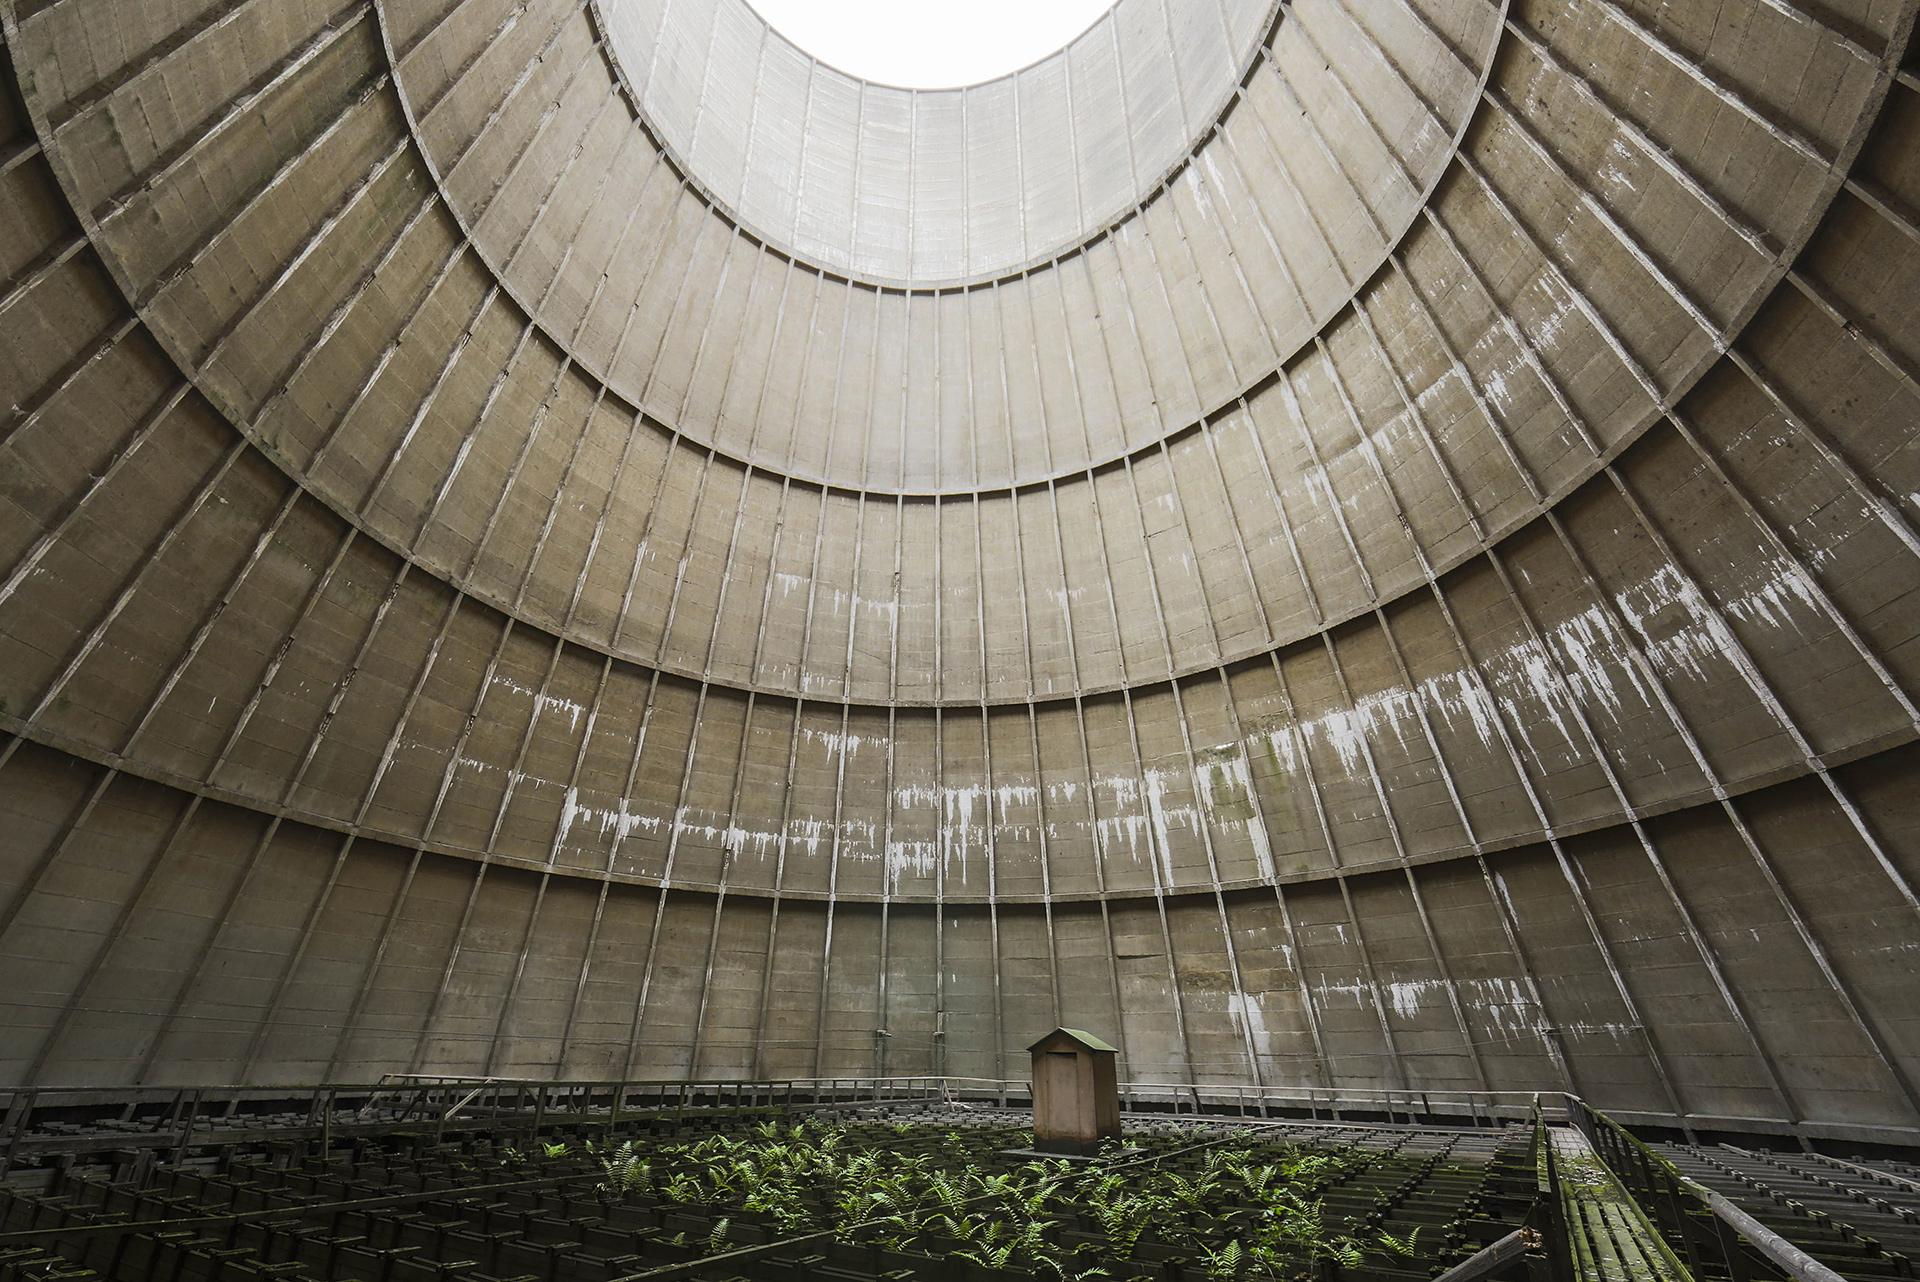 Natureza conquista Arquitetura abandonada - fotos de Jonk Artes & contextos jonk 4